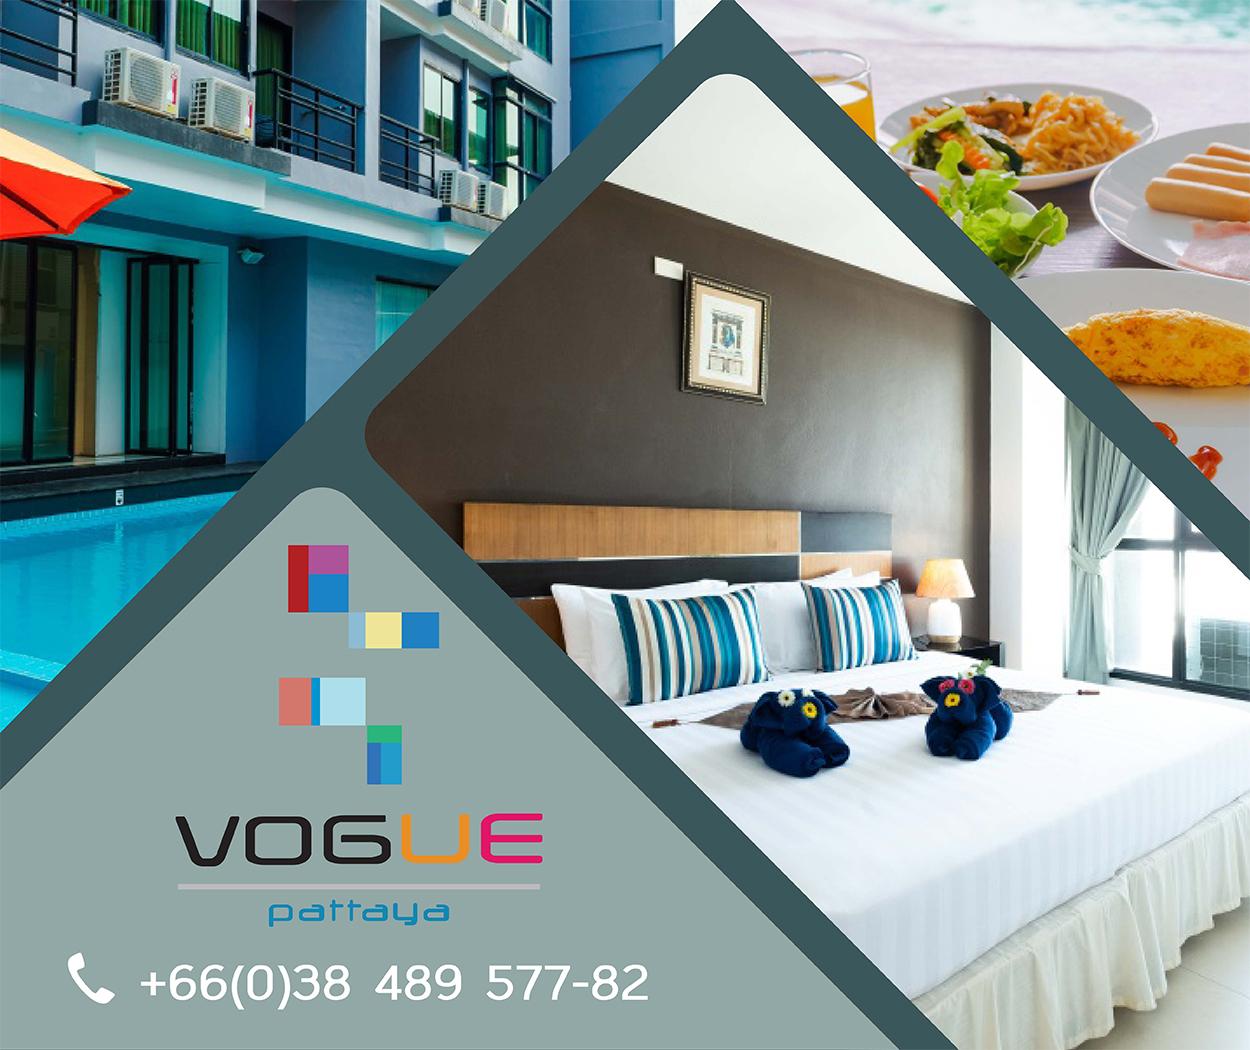 The Vogue Pattaya Hotel